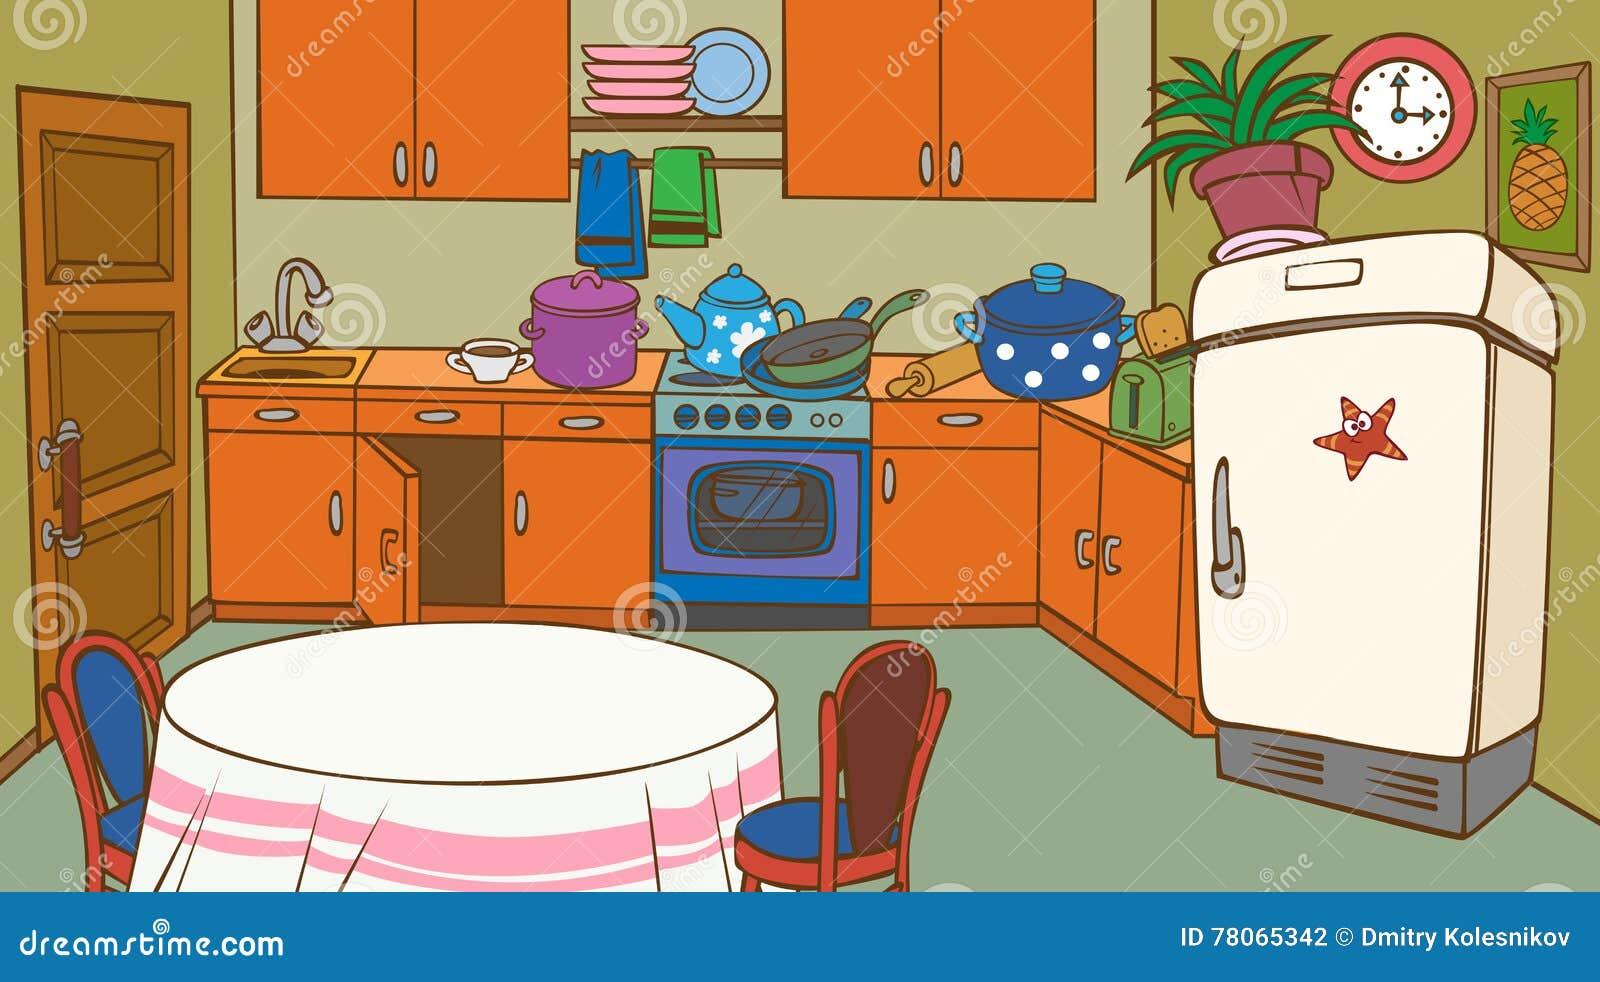 Cartoon animated kitchen stock illustration. Illustration of table on animated kitchen, cartoon clean kitchen, top cartoon from the kitchen, drawing of cartoon kitchen, cartoon restaurant kitchen, cartoon mother with a kitchen,